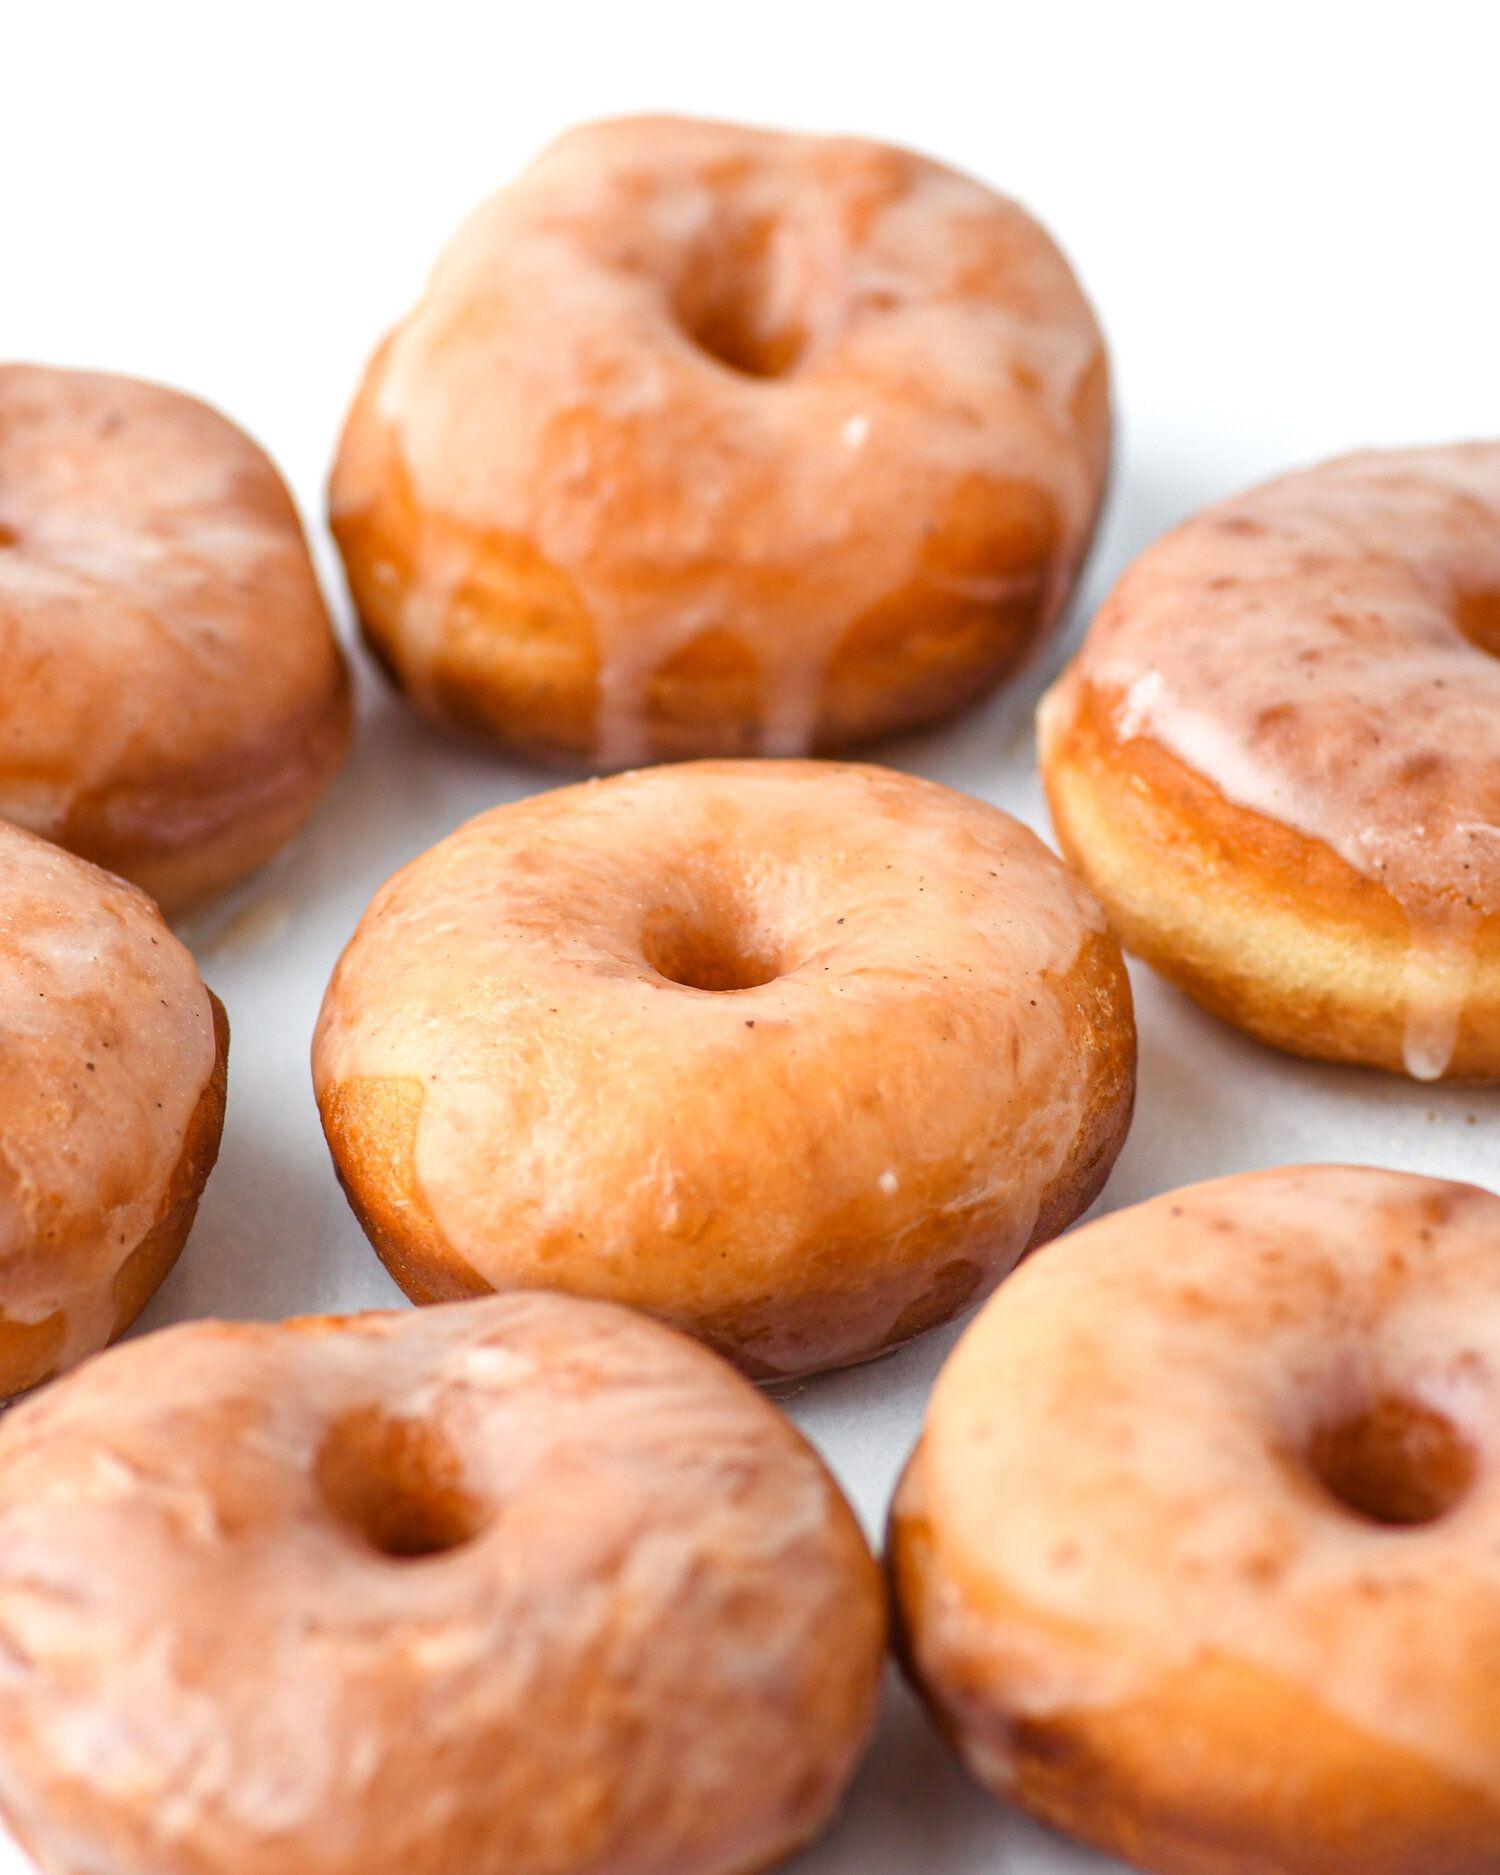 Buttermilk Donuts Buttermilk In 2020 Easy Donut Recipe Donut Recipes Buttermilk Recipes